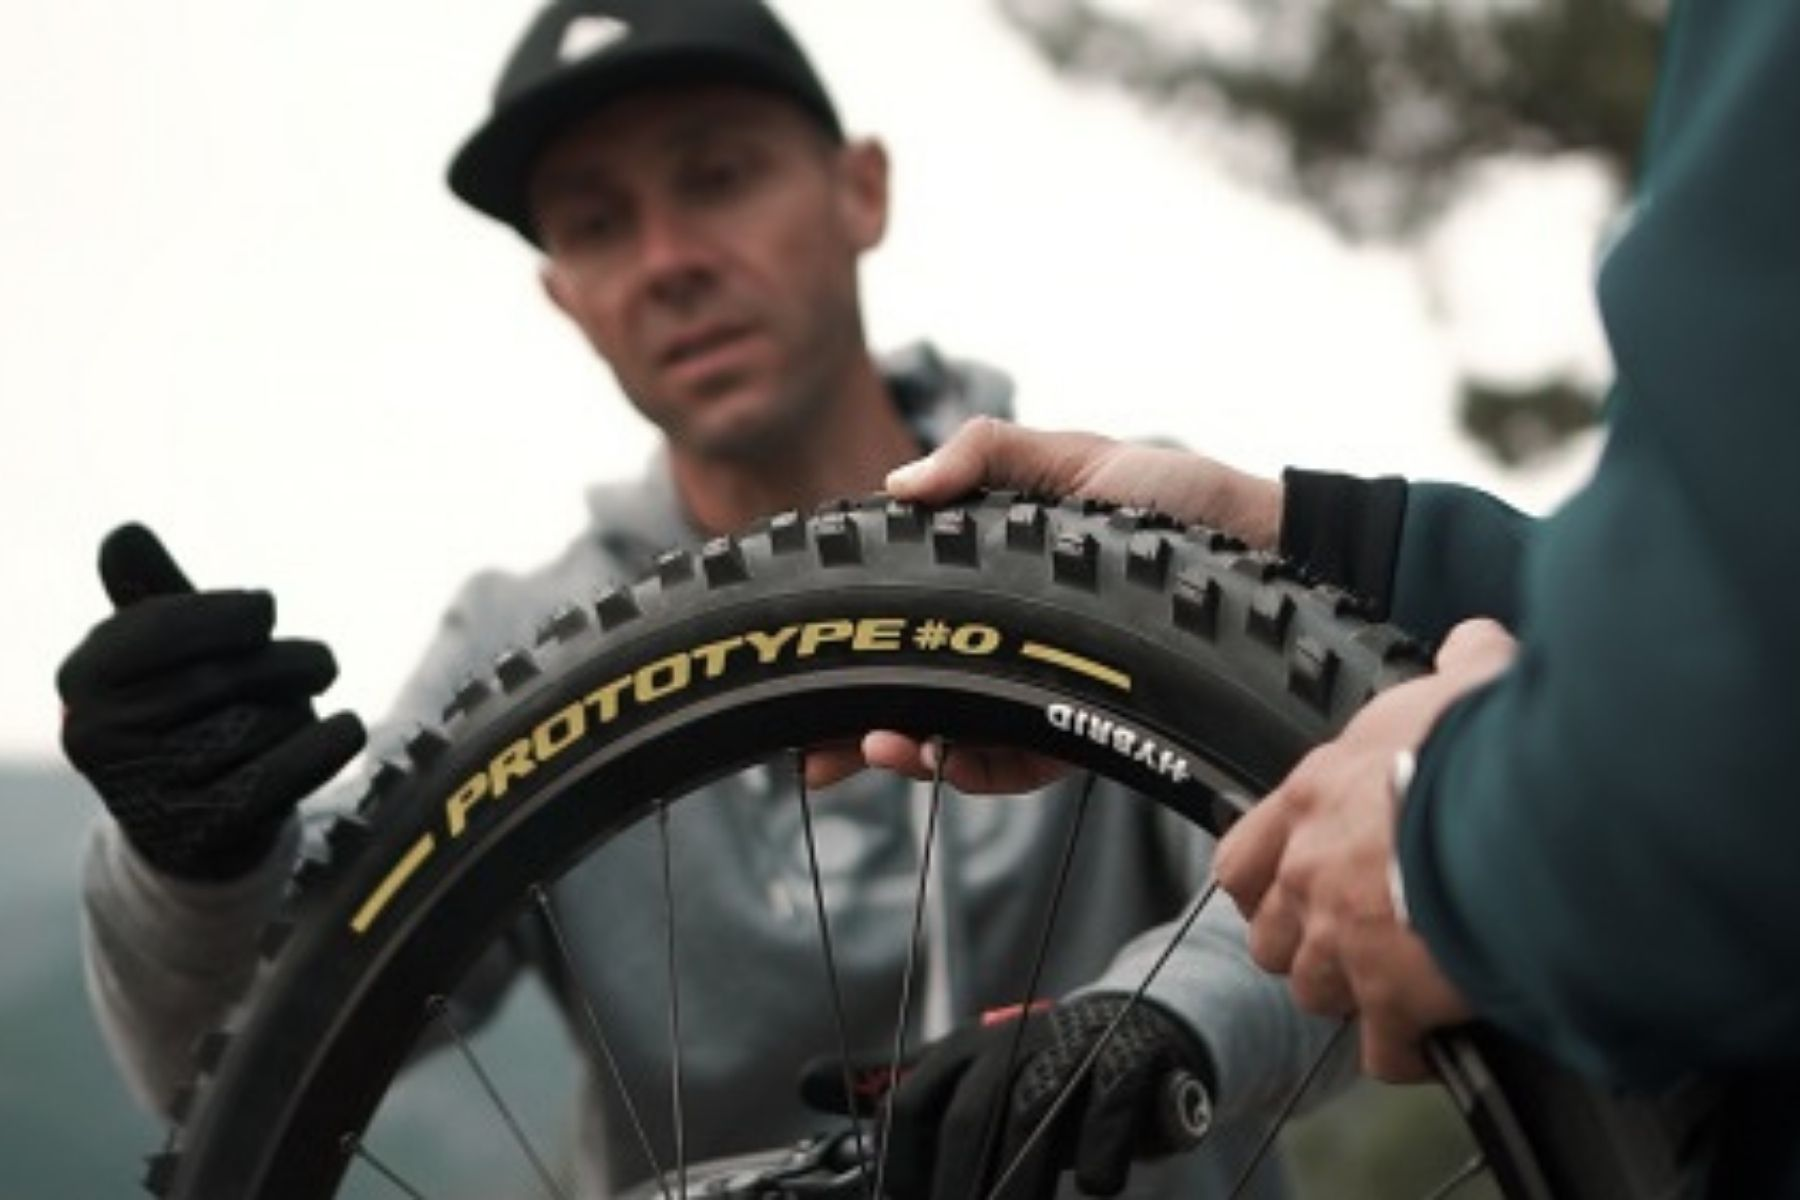 Pirelli und Fabien Barel entwickeln Scorpion Gravity Racing Range